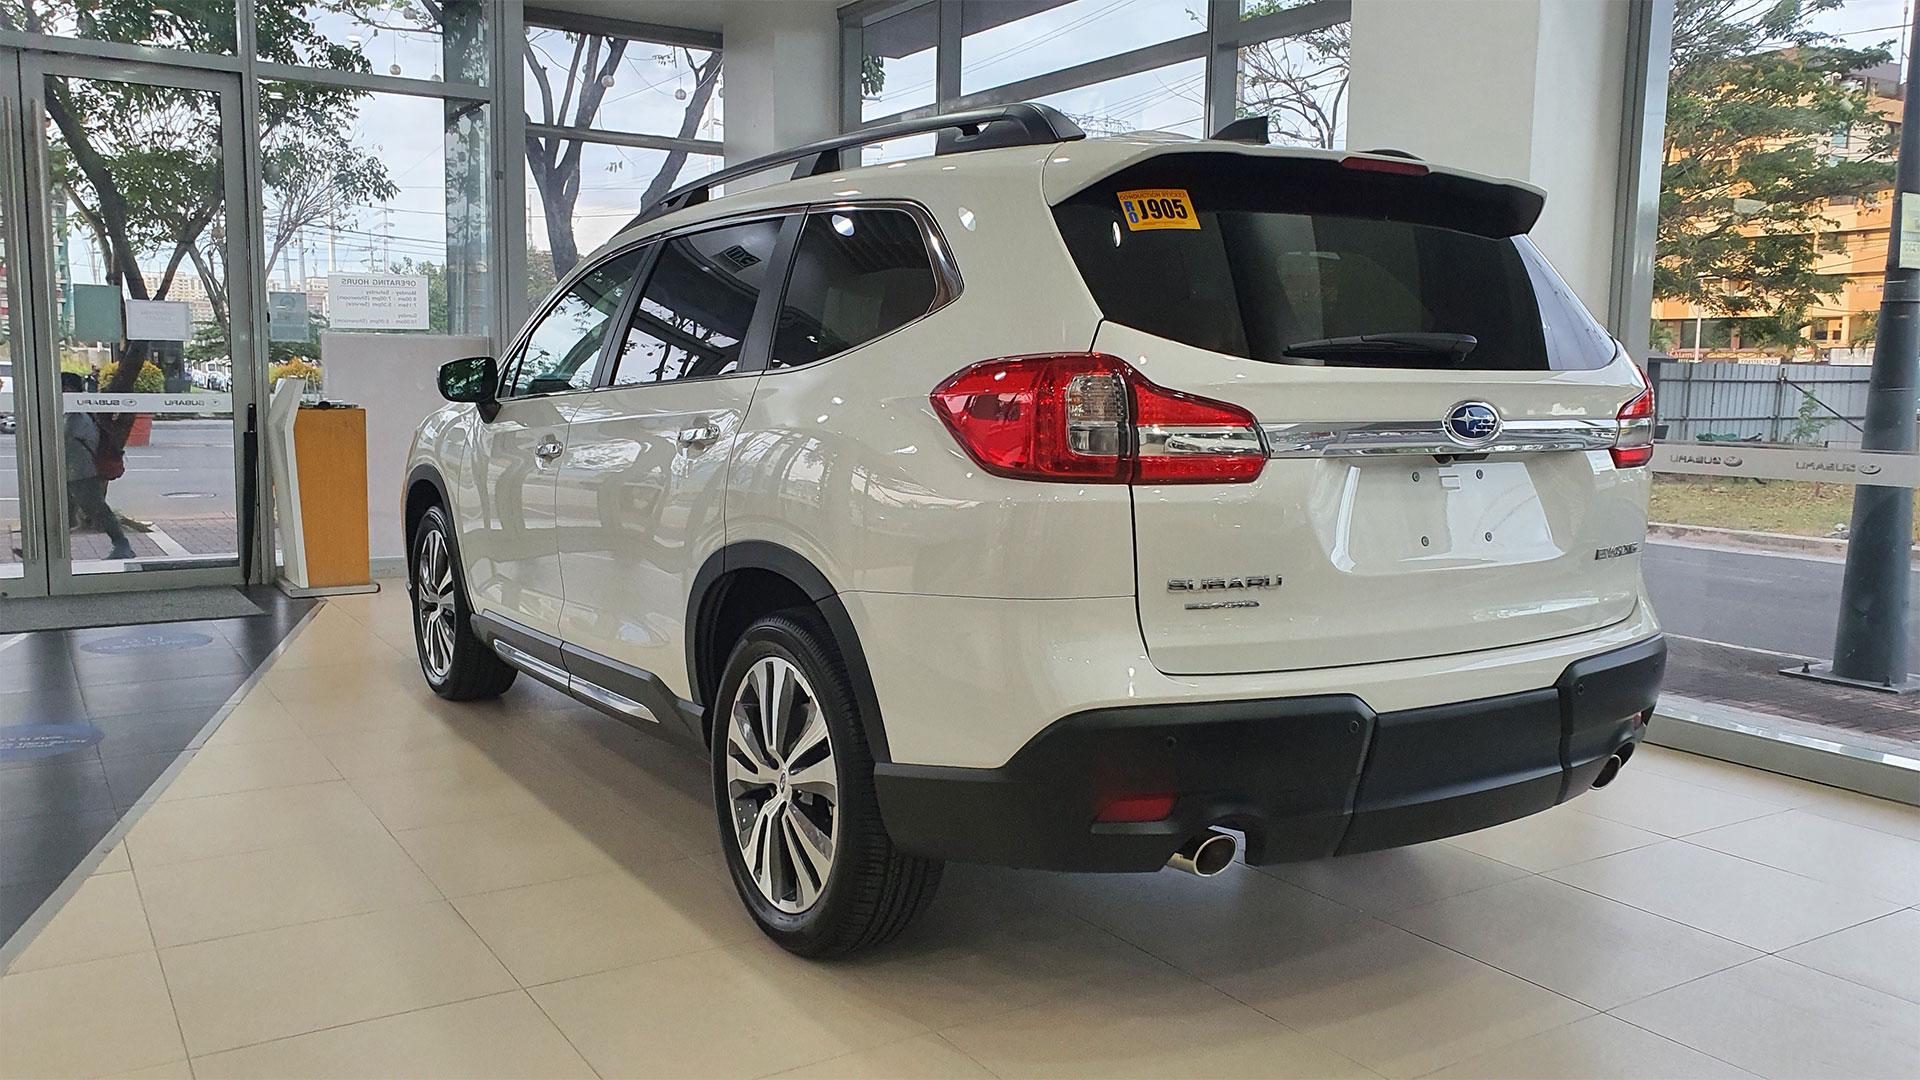 The Subaru Evoltis Angled Rear View